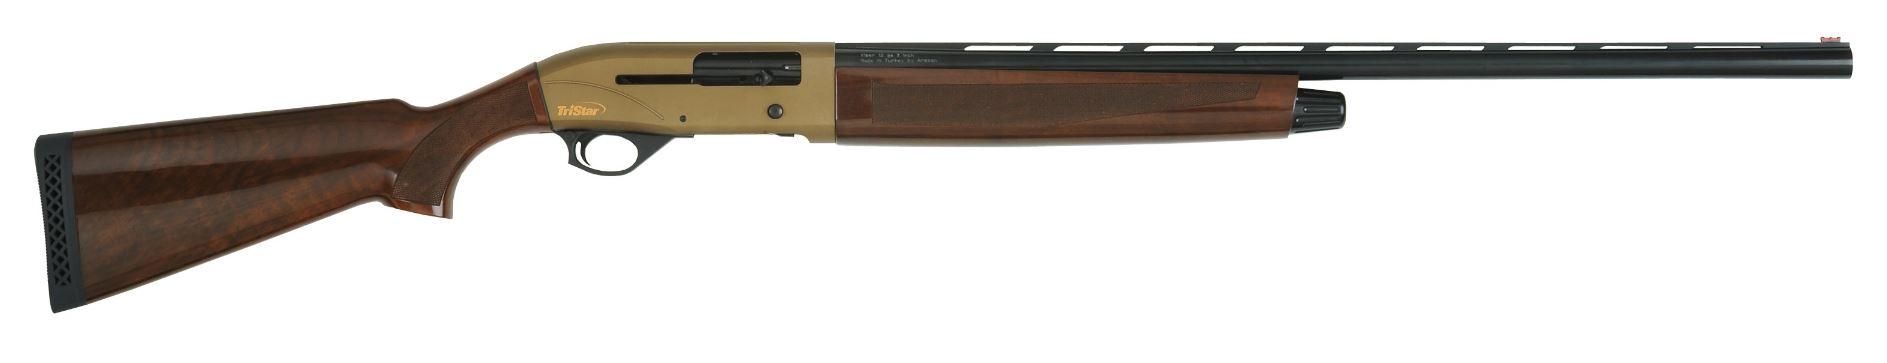 TriStar Sporting Arms Viper G2 Bronze 20 Gauge